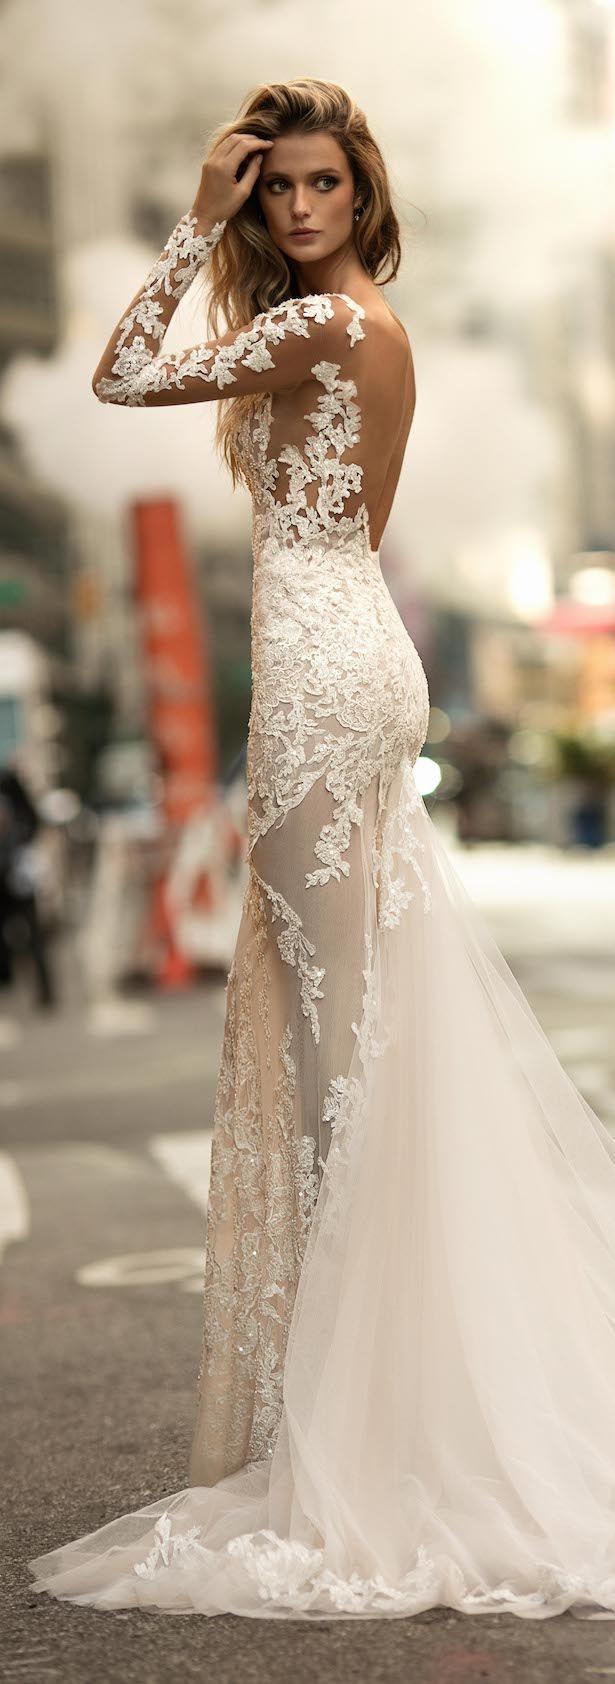 Wedding dress runaway bride  Berta Bridal Fall  Collection  Matrimonio  Pinterest  Berta